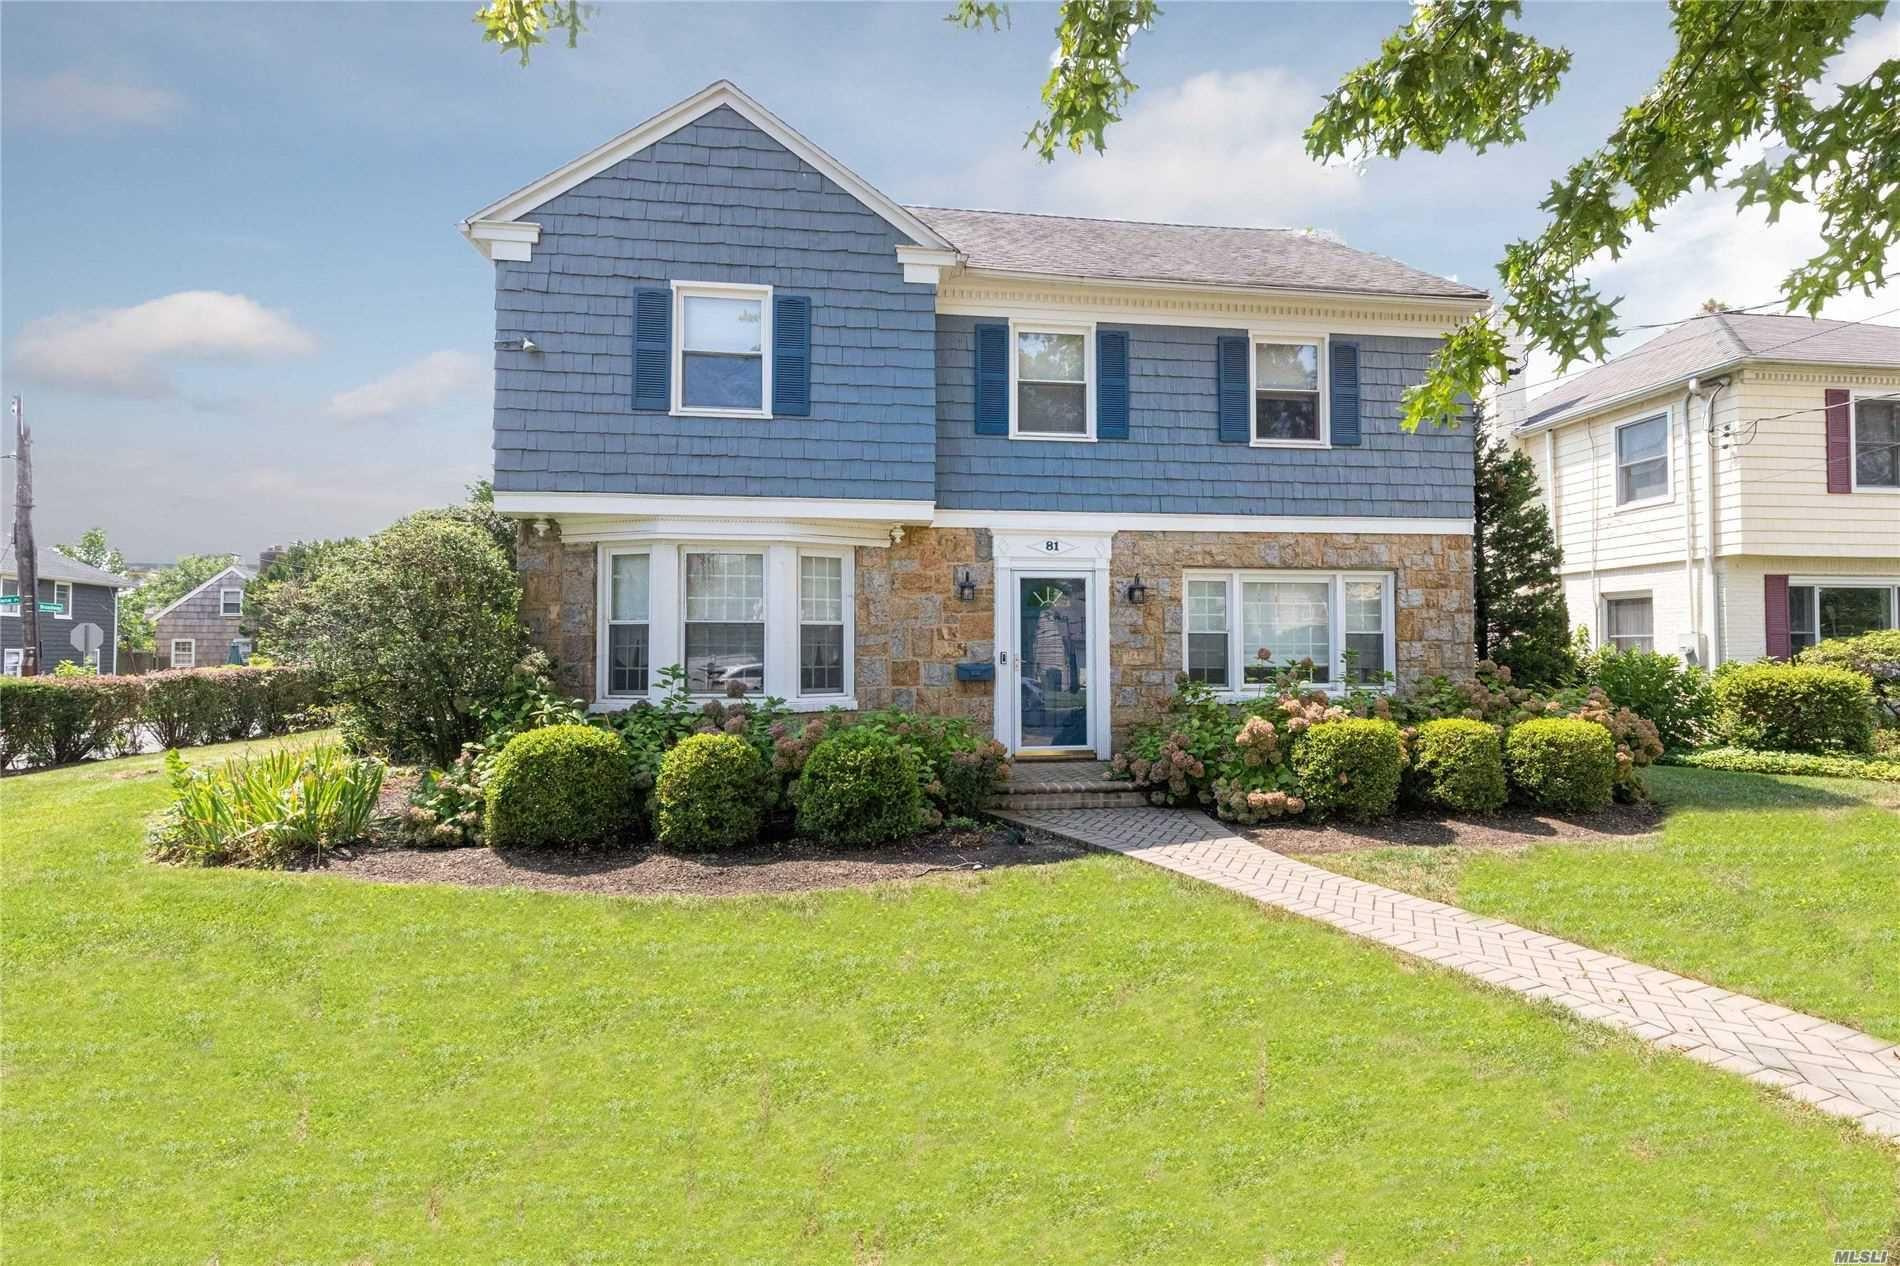 81 Johnson Place, Woodmere, NY 11598 - MLS#: 3246626